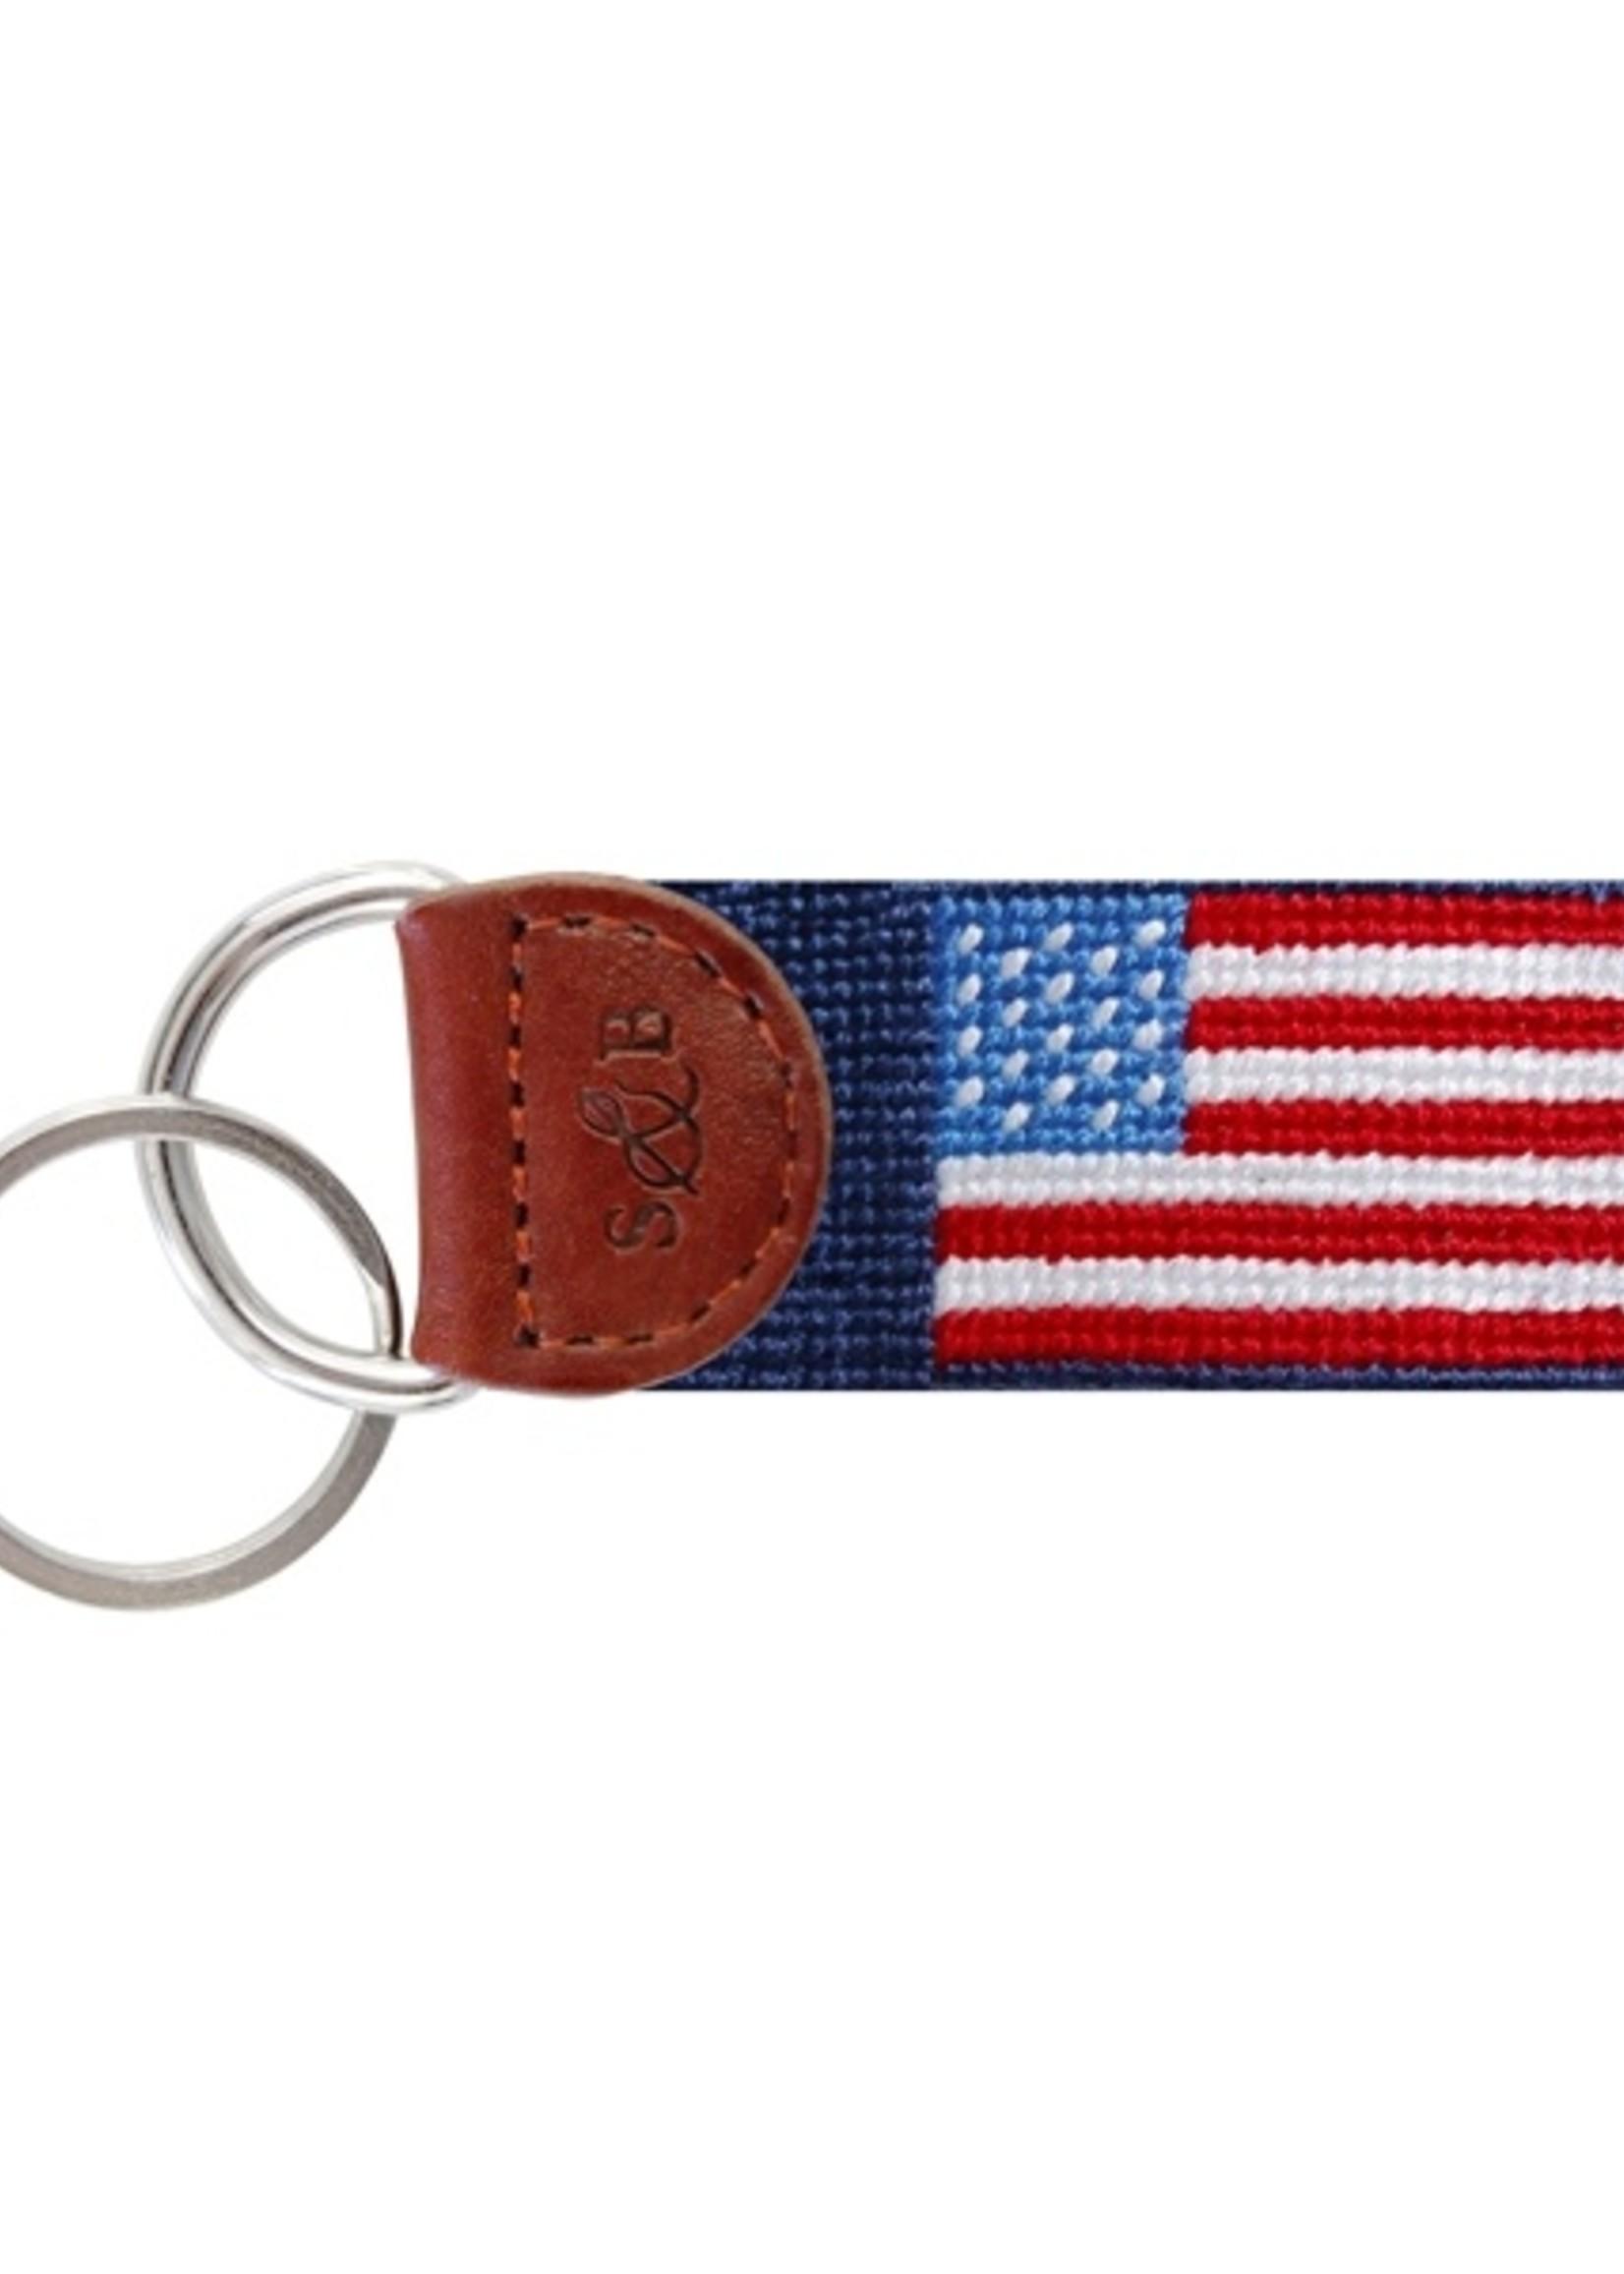 Smathers & Branson American Flag Key Fob Classic Blue